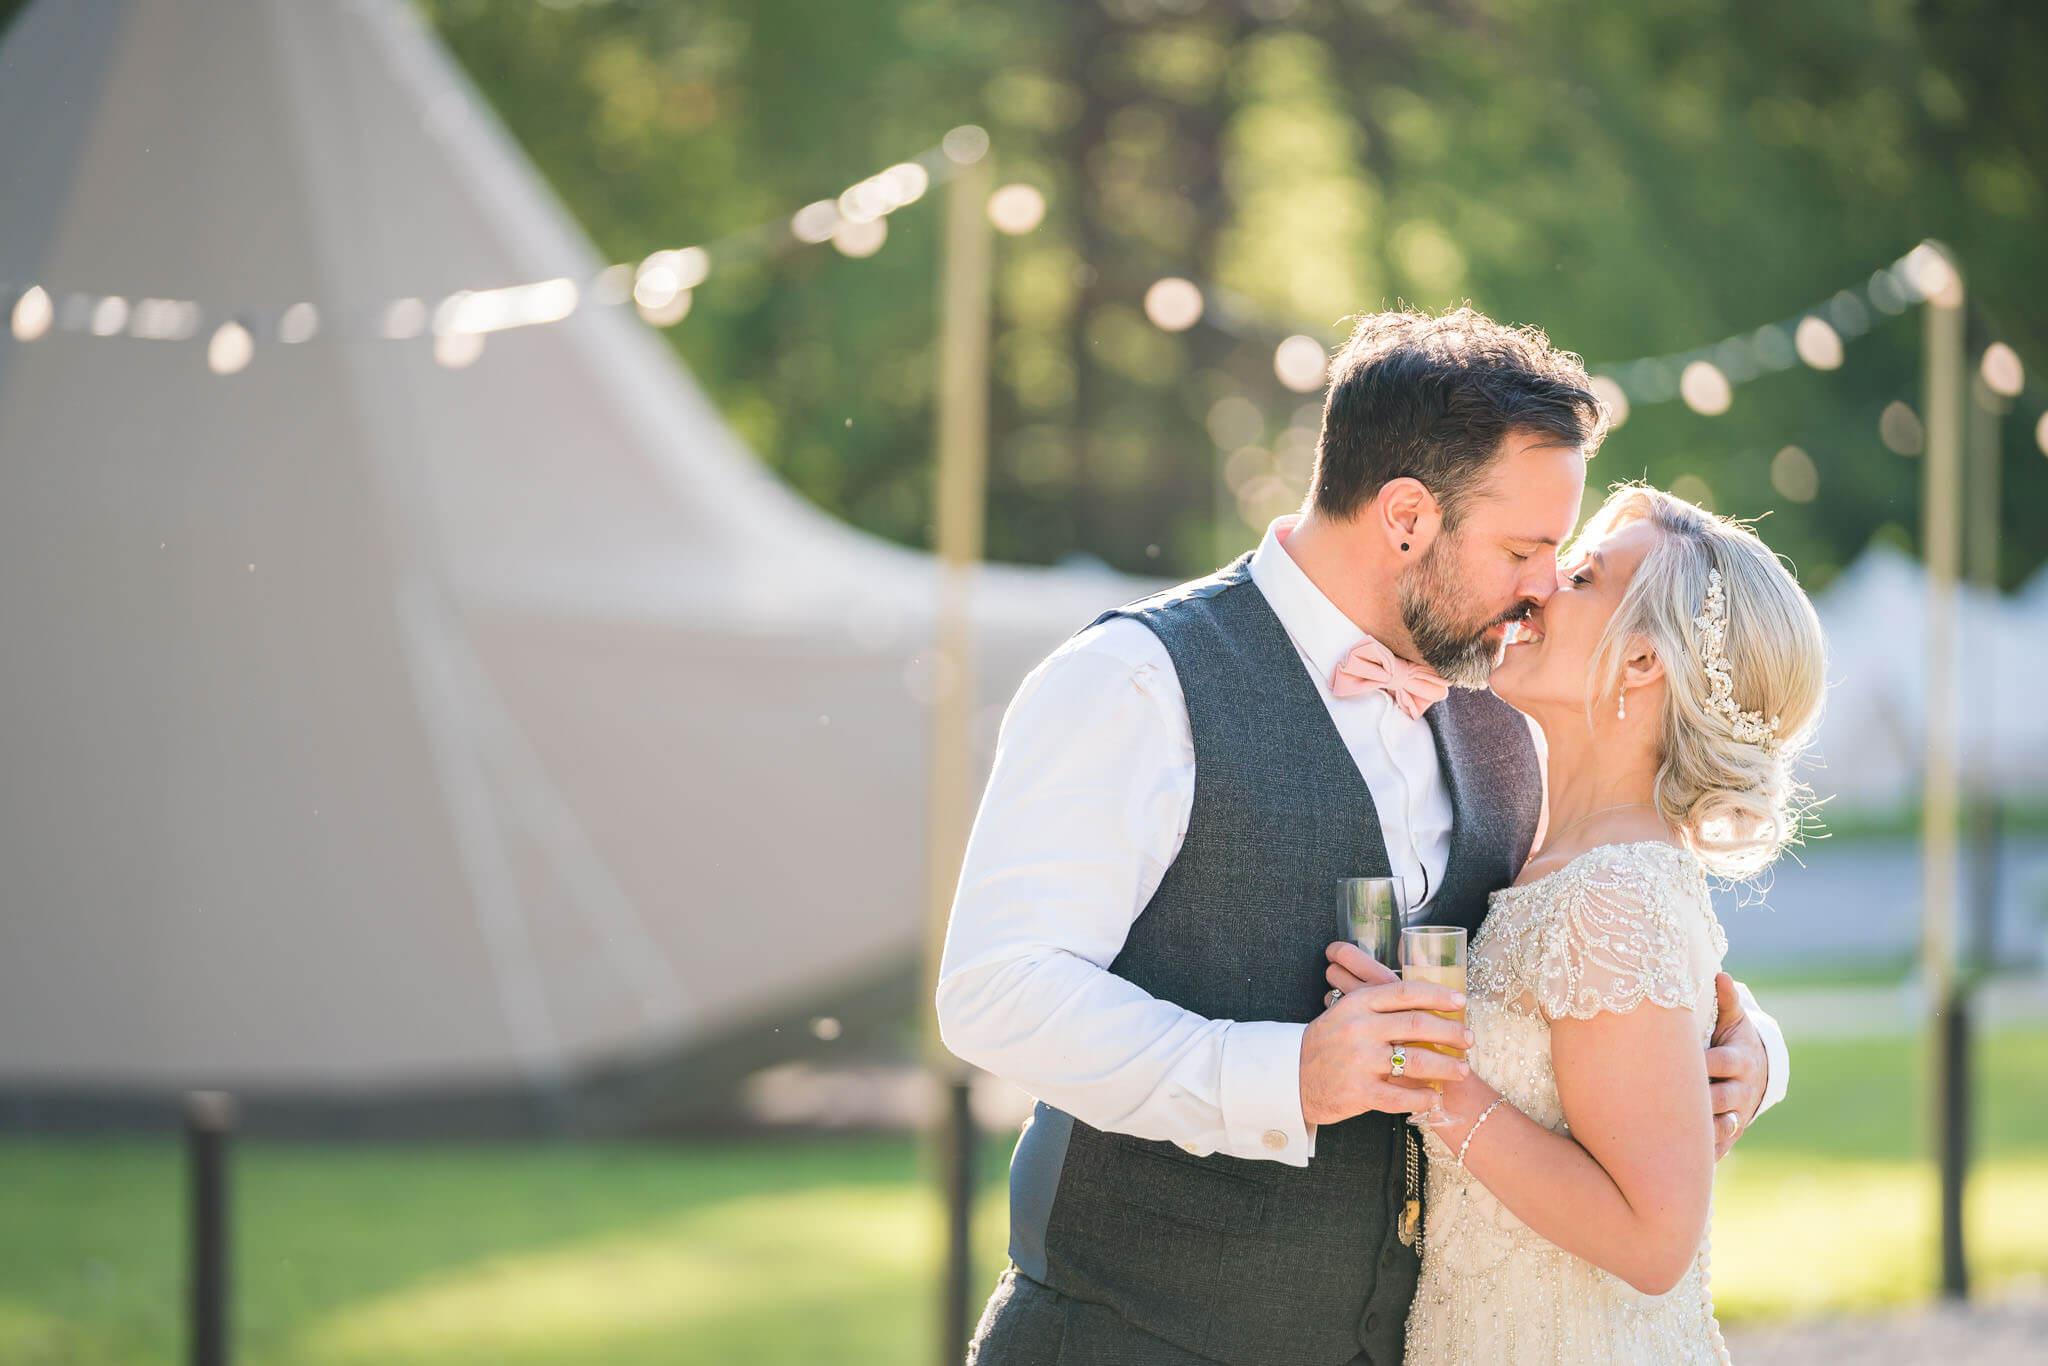 Wiltshire Wedding Photographer, Festival Bride and Groom